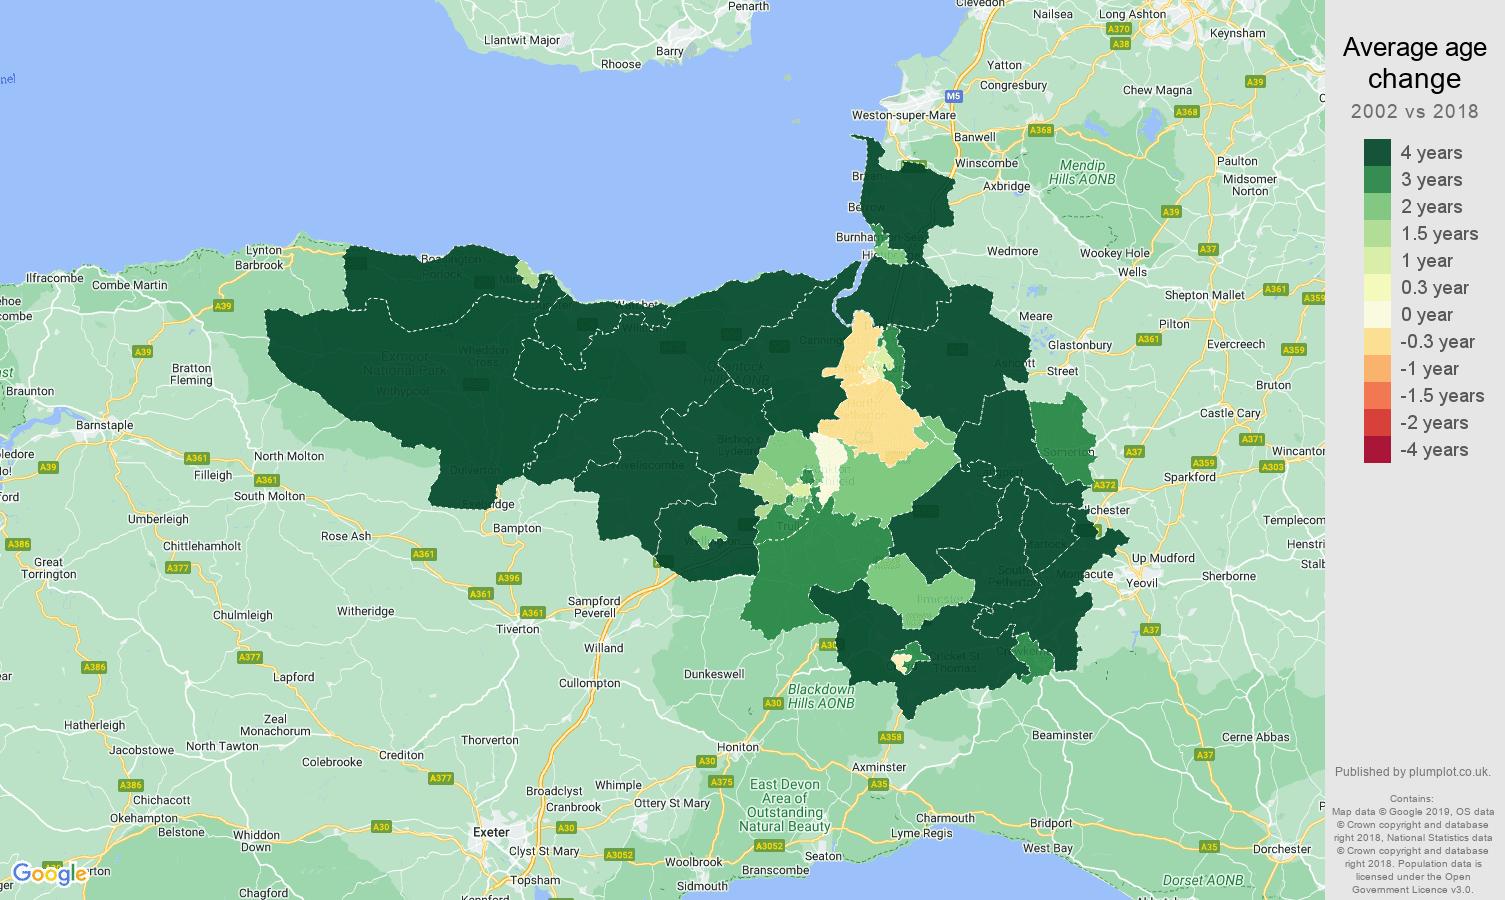 Taunton average age change map